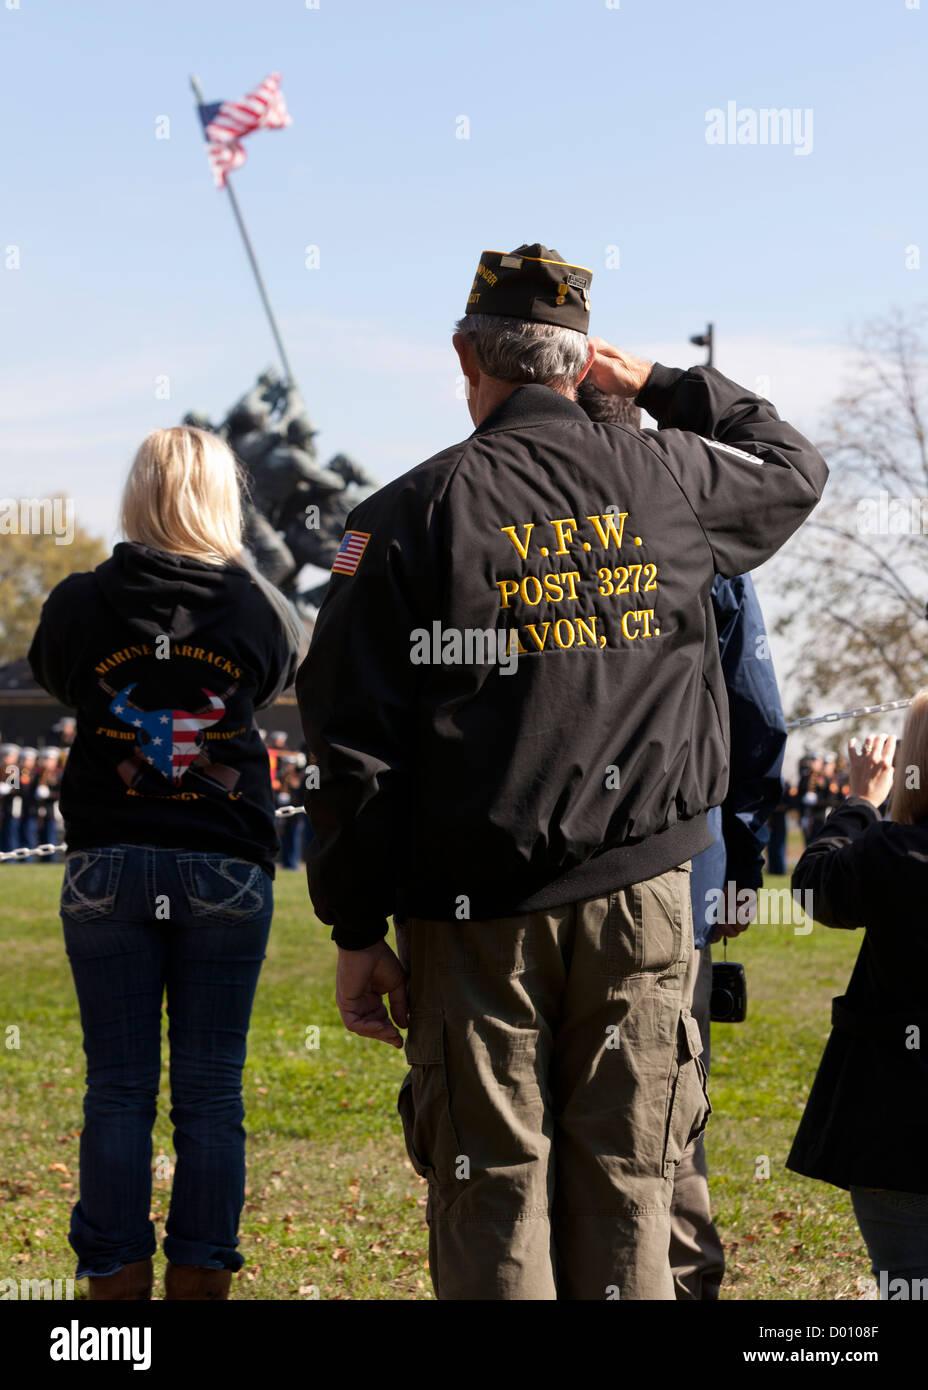 US military veteran saluting the American flag - Stock Image